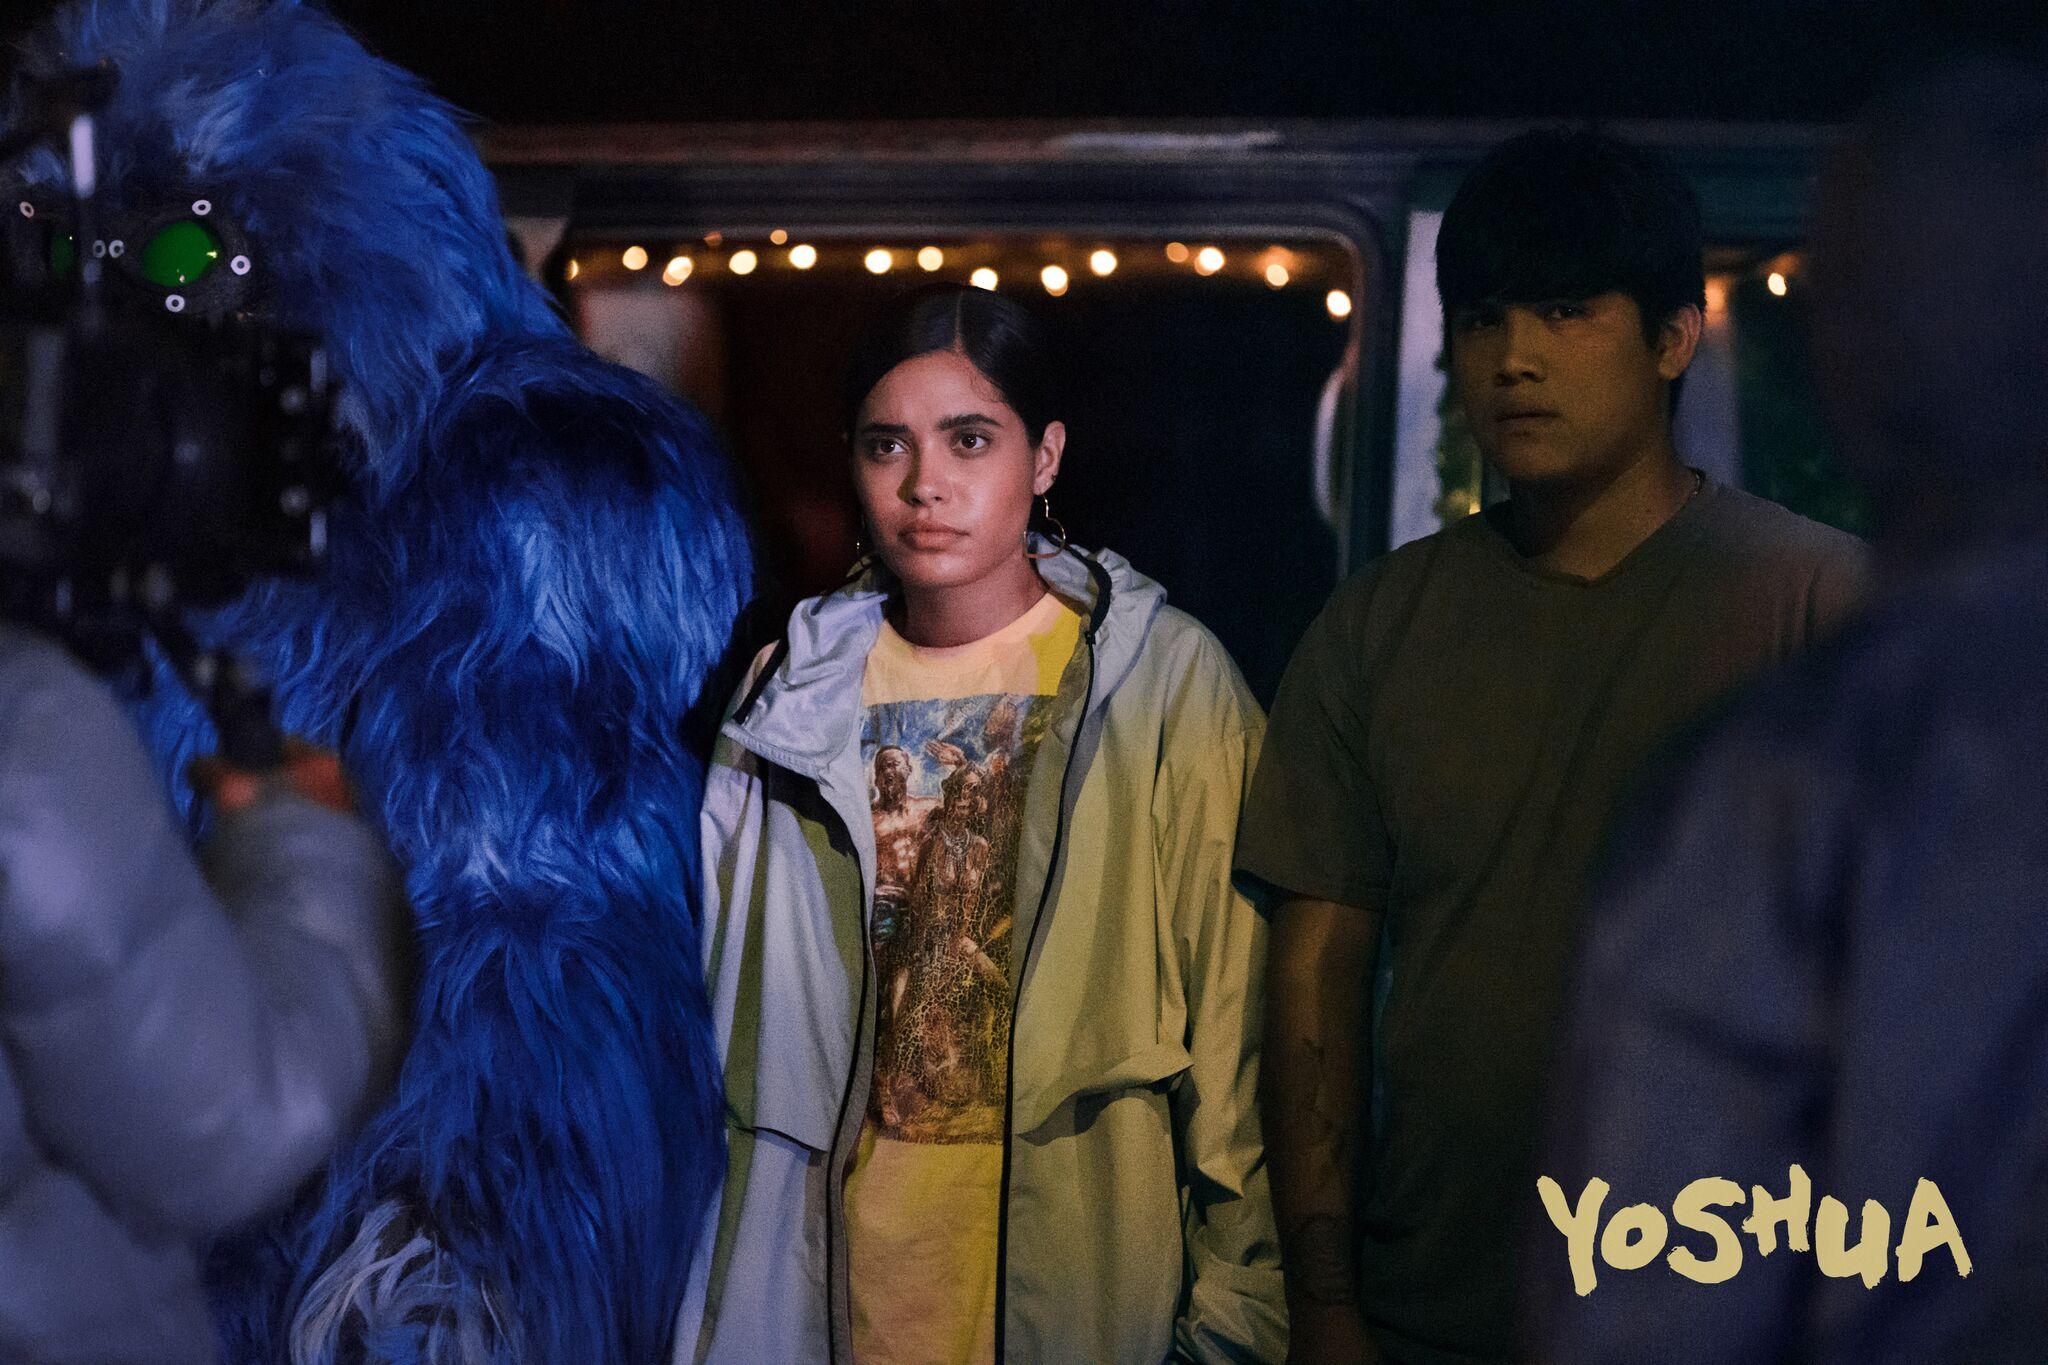 Left to Right: Yoshua (Kim House), Sam (Otmara Merrero), and Francisco (Johnny Ortiz).  Source: Fullscreen and AT&T.